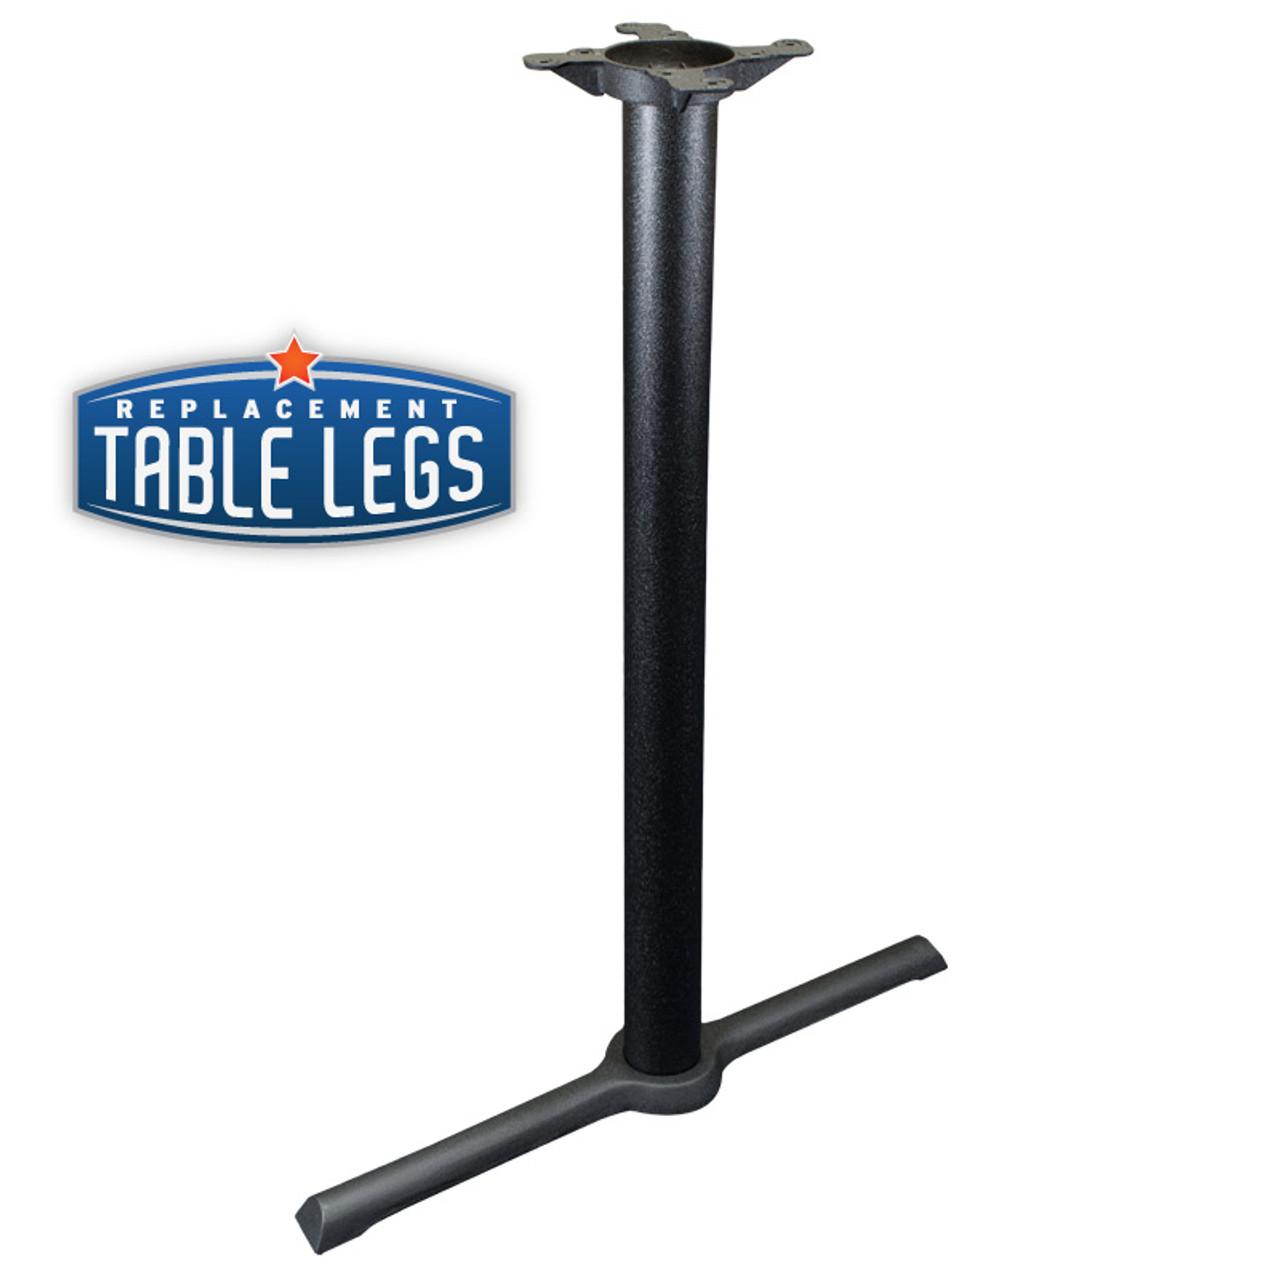 "CAST IRON TABLE BASE, X Style 5""x30"" End, 40"" height, 3"" diameter steel column - replacementtablelegs.com"